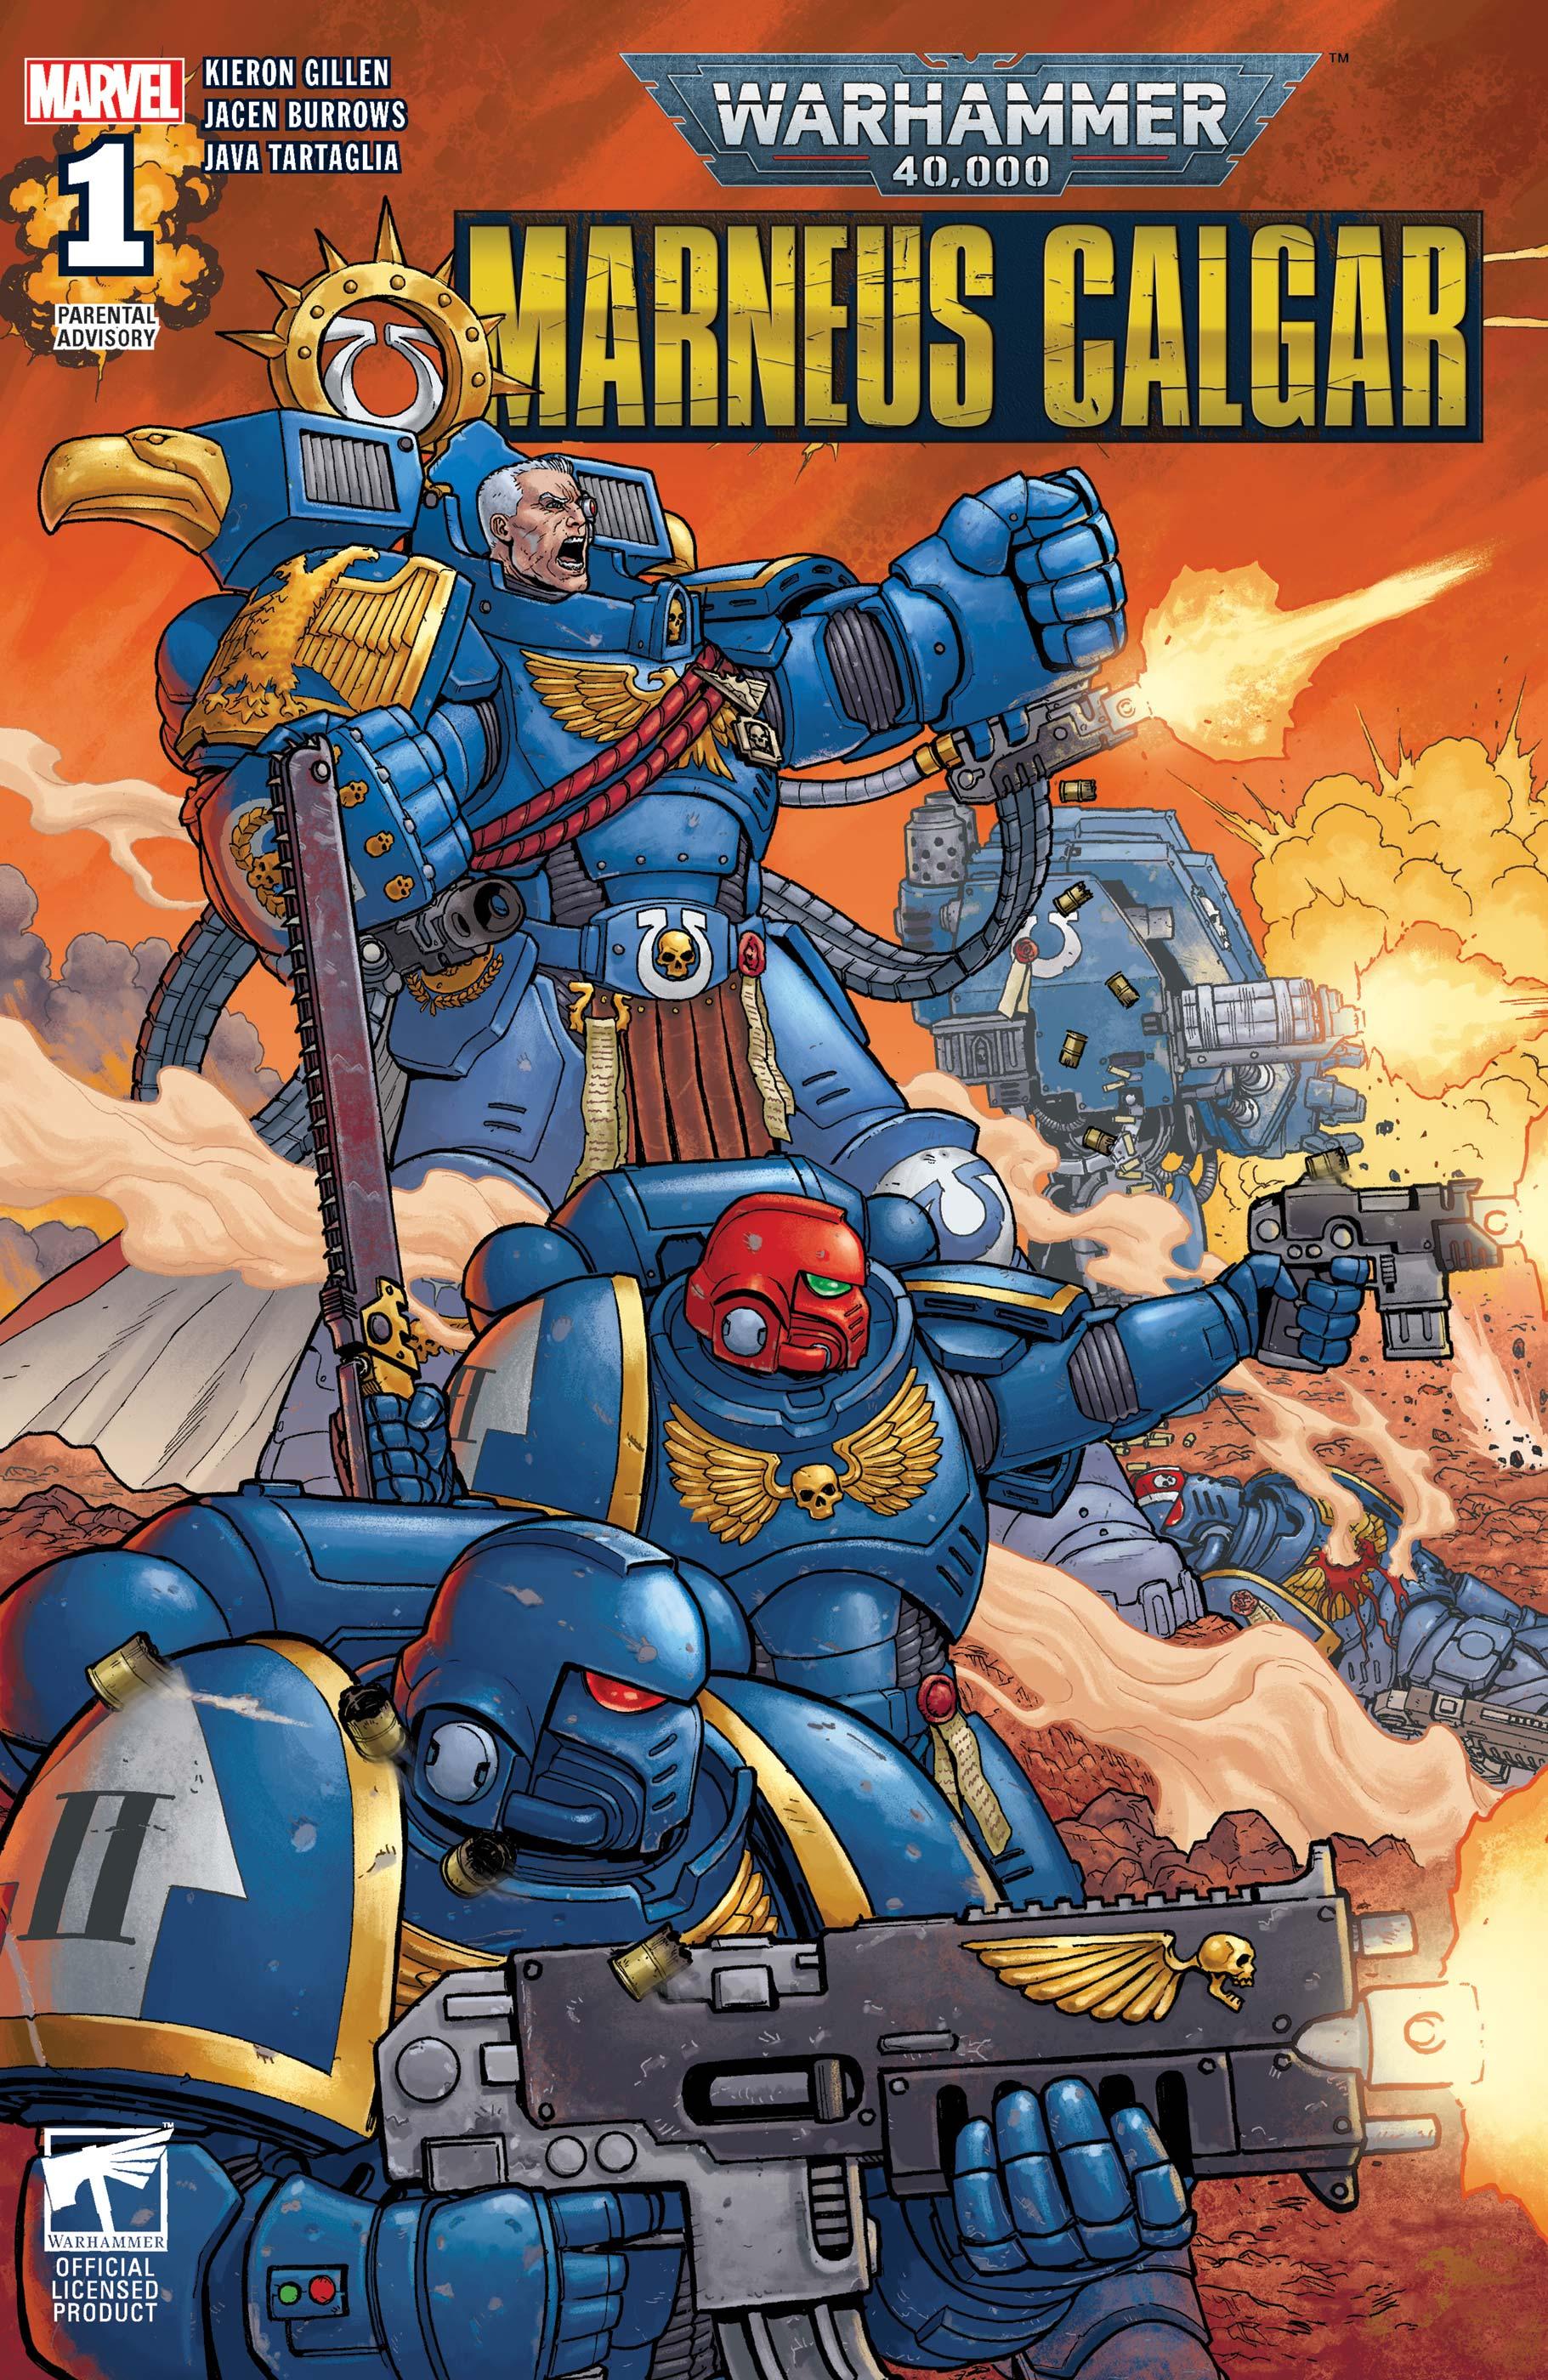 Warhammer 40,000: Marneus Calgar (2020) #1